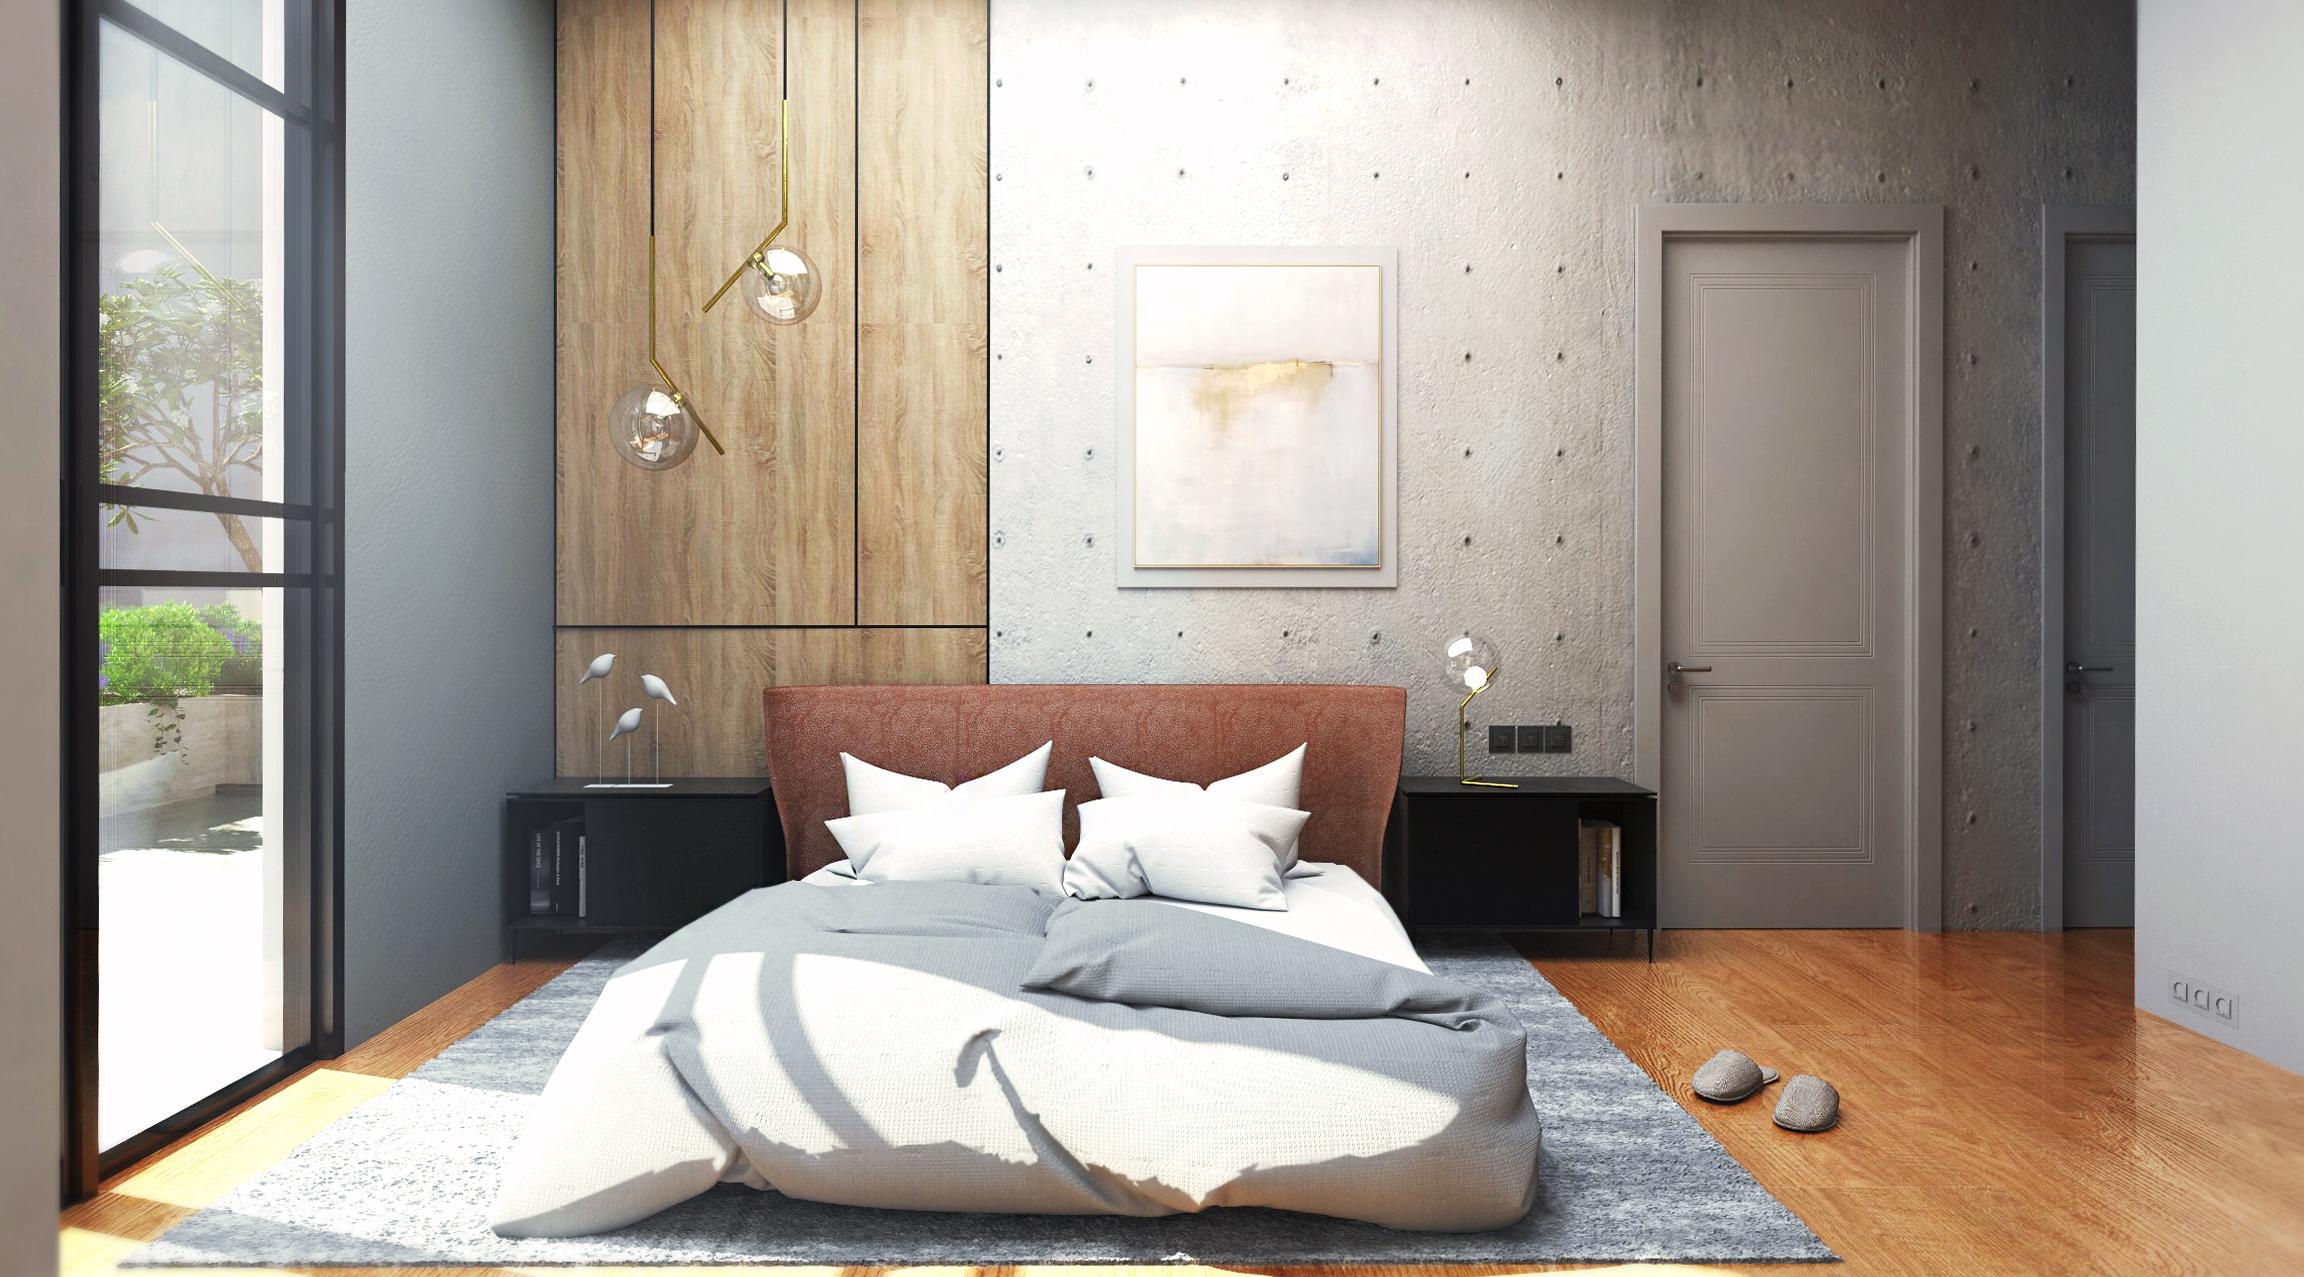 THE PENTHOUSE |  Gila Shemie Zakay Interior Design